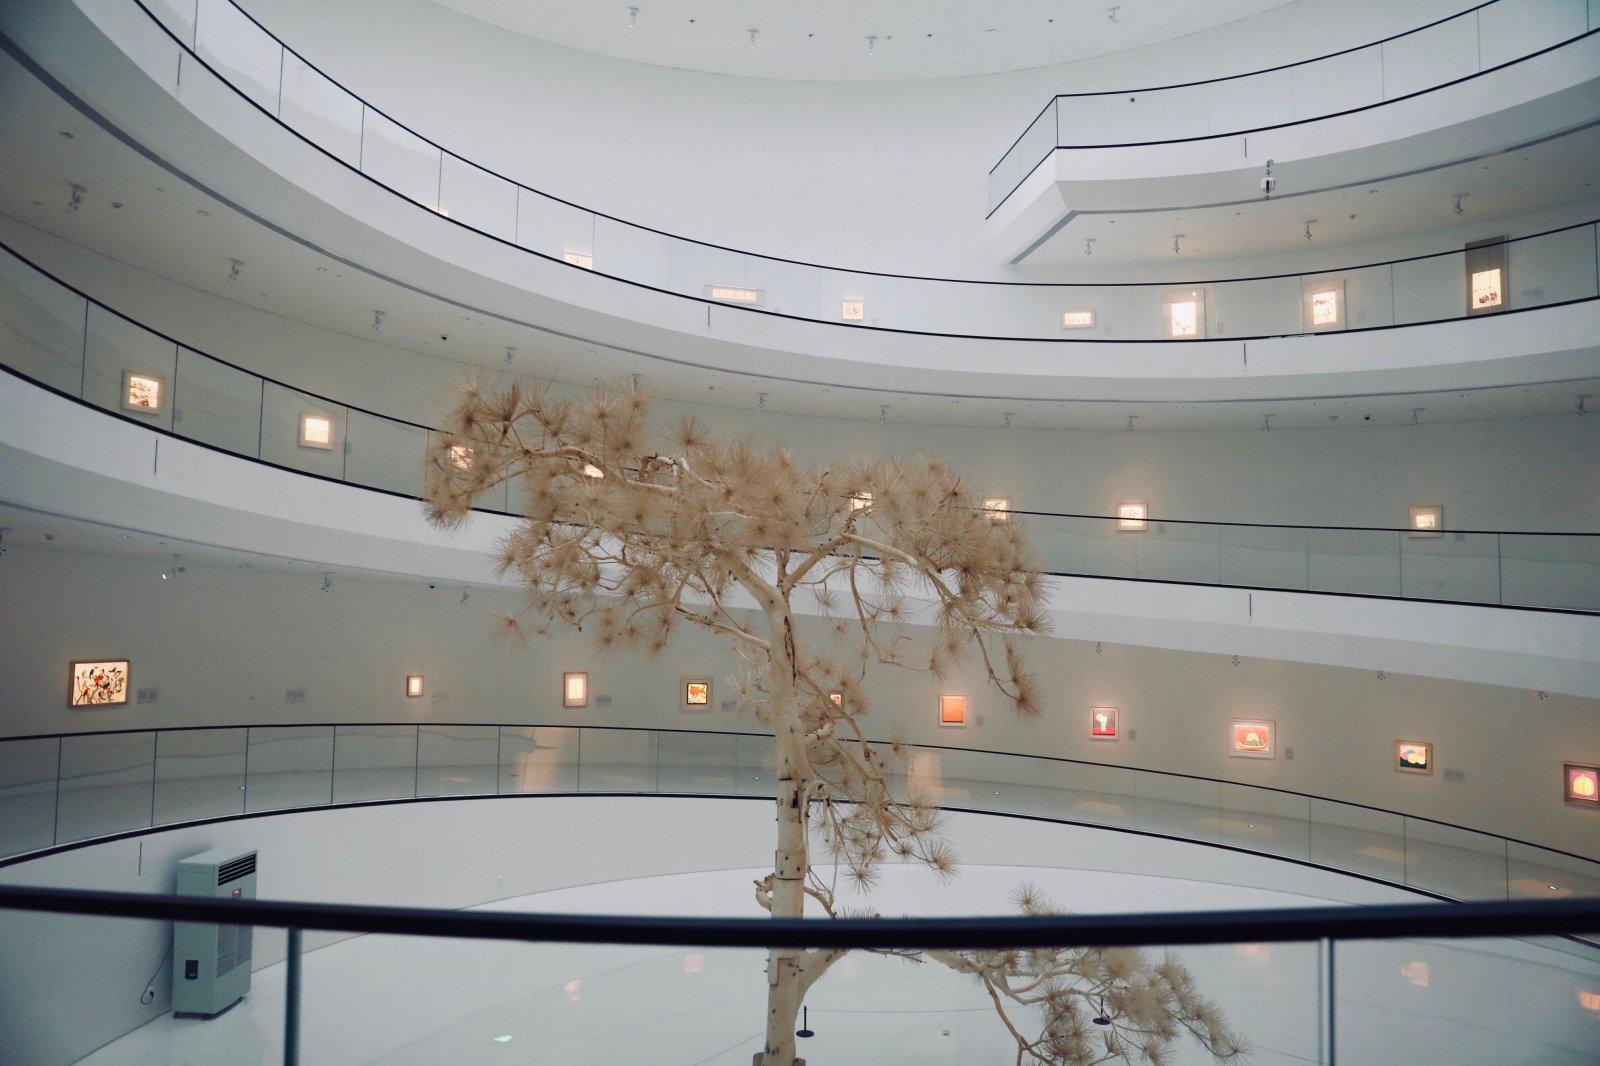 FENDI 2019-20 秋冬男裝及女裝系列時裝秀將於 5 月 31 日登陸上海